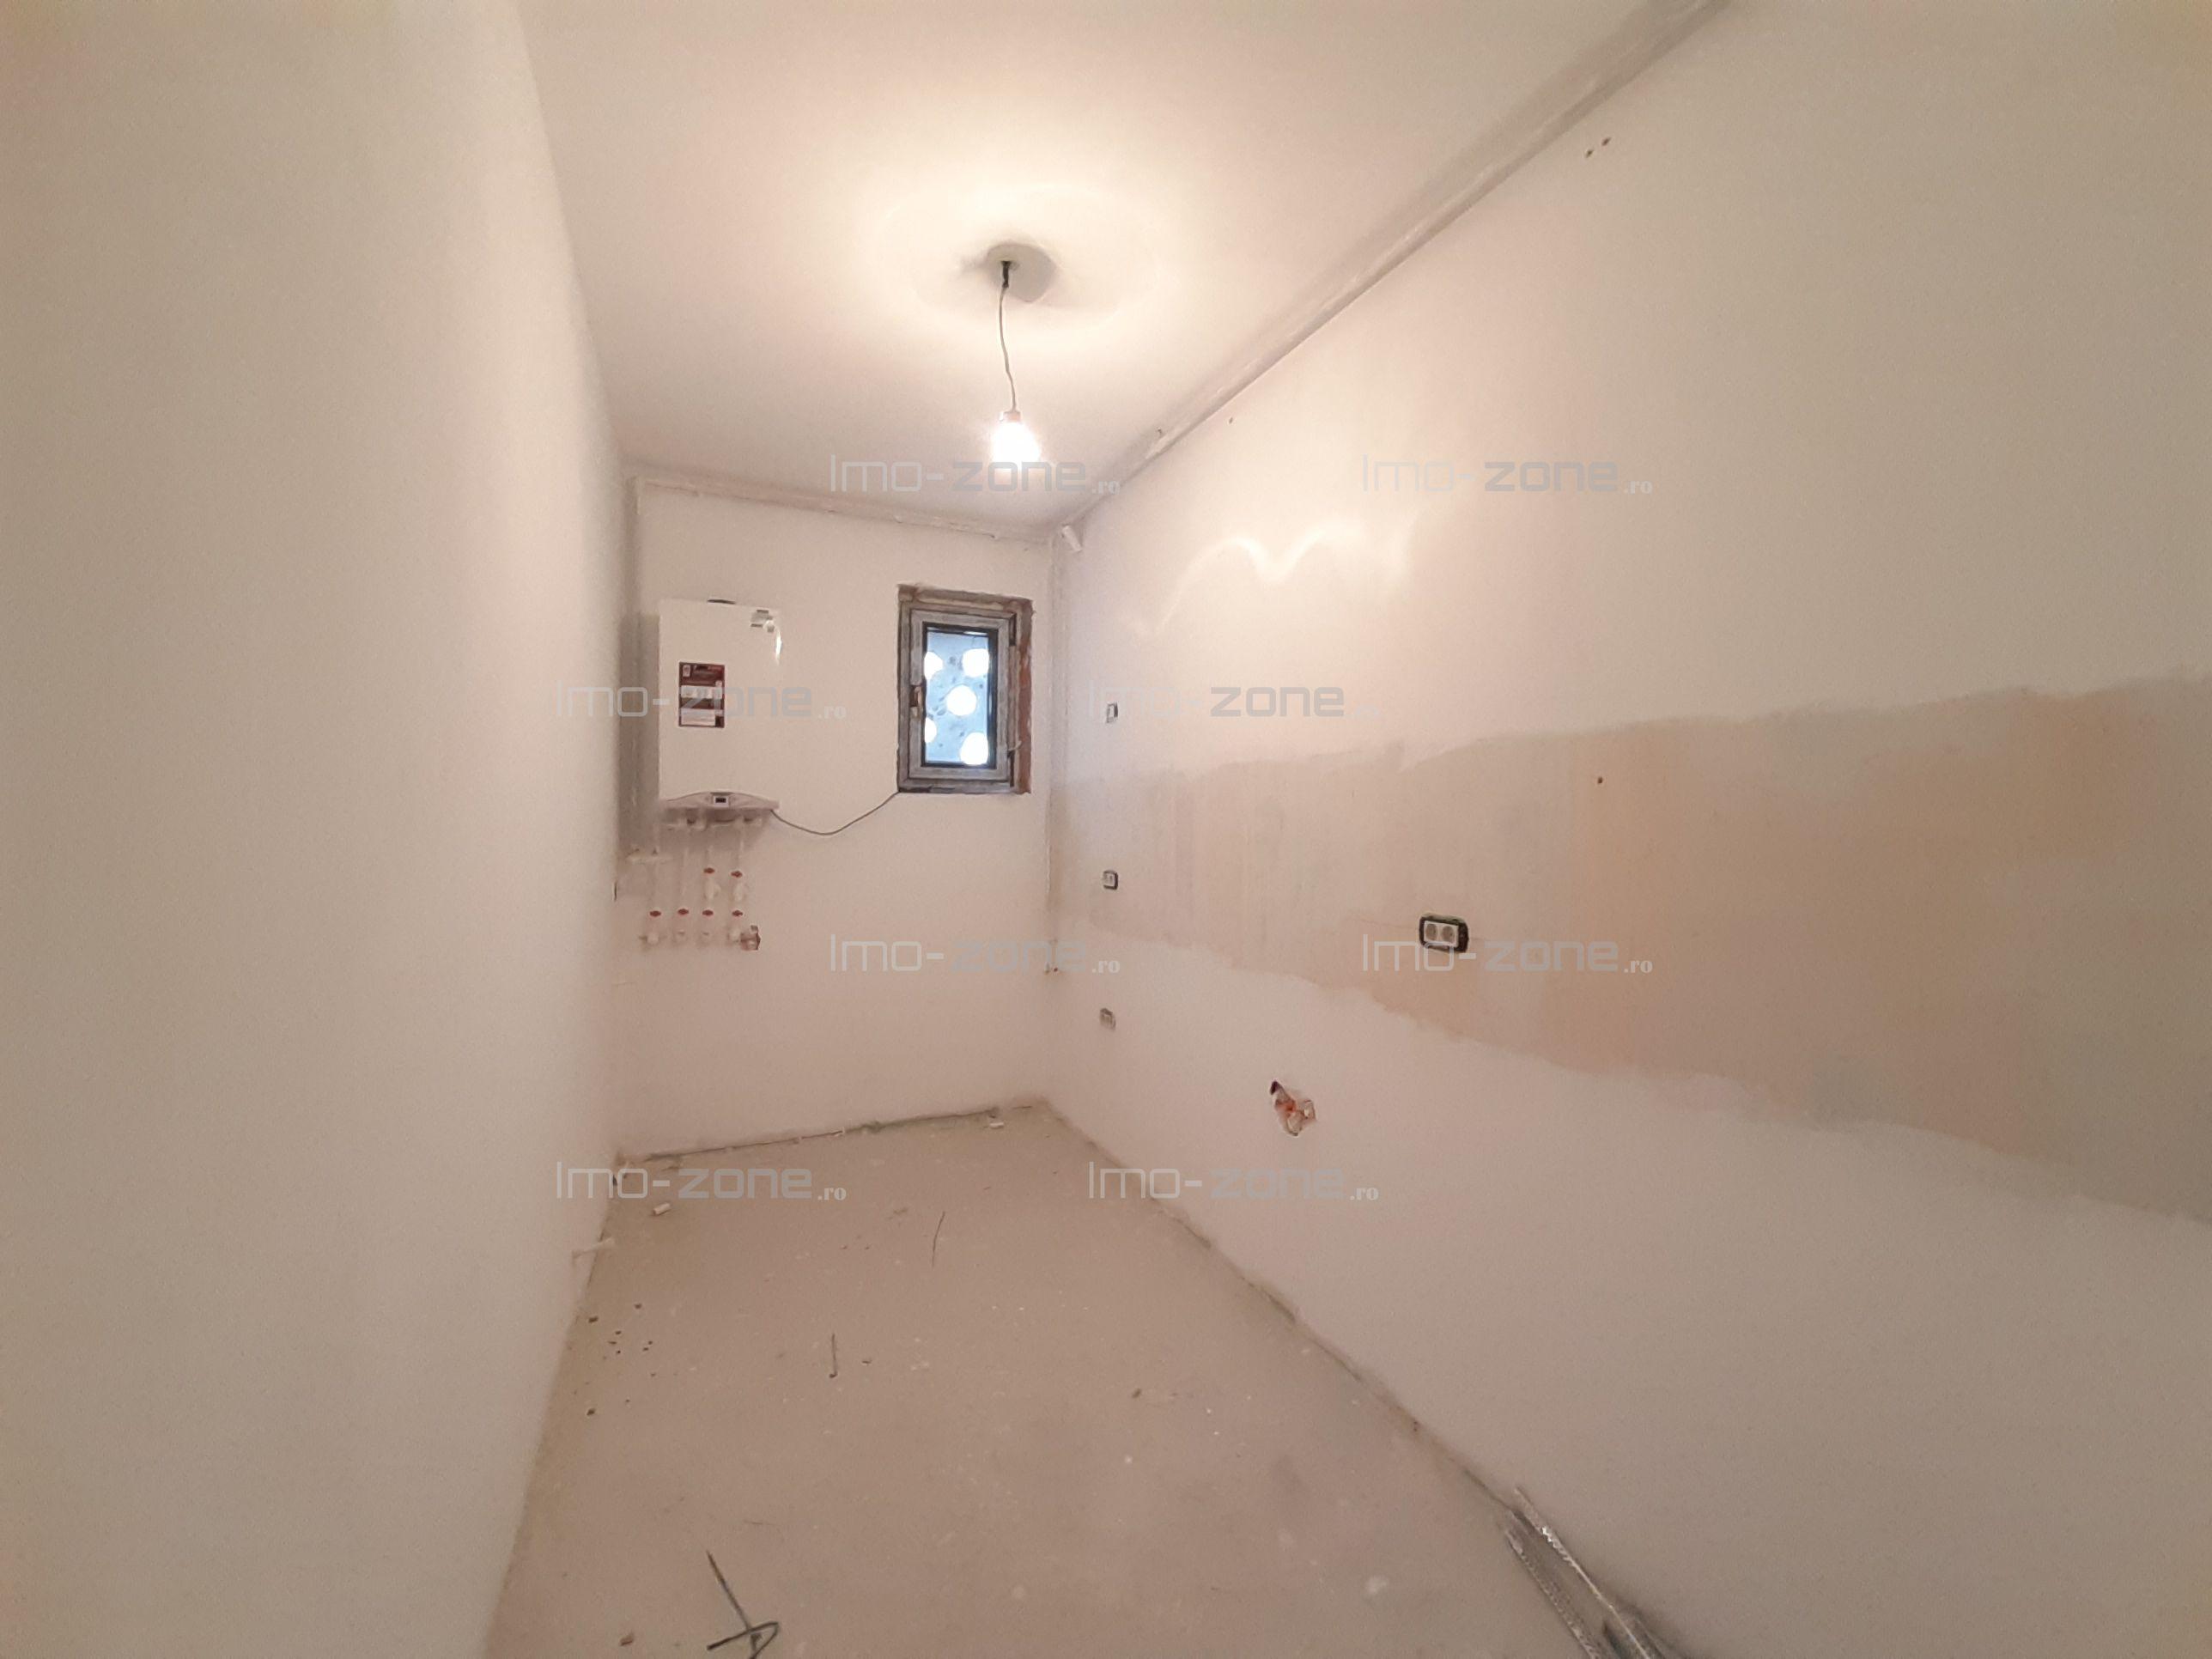 Apartament 2 camere, 75 mp, finalizat, Drumul Taberei, comision 0%, plata cash